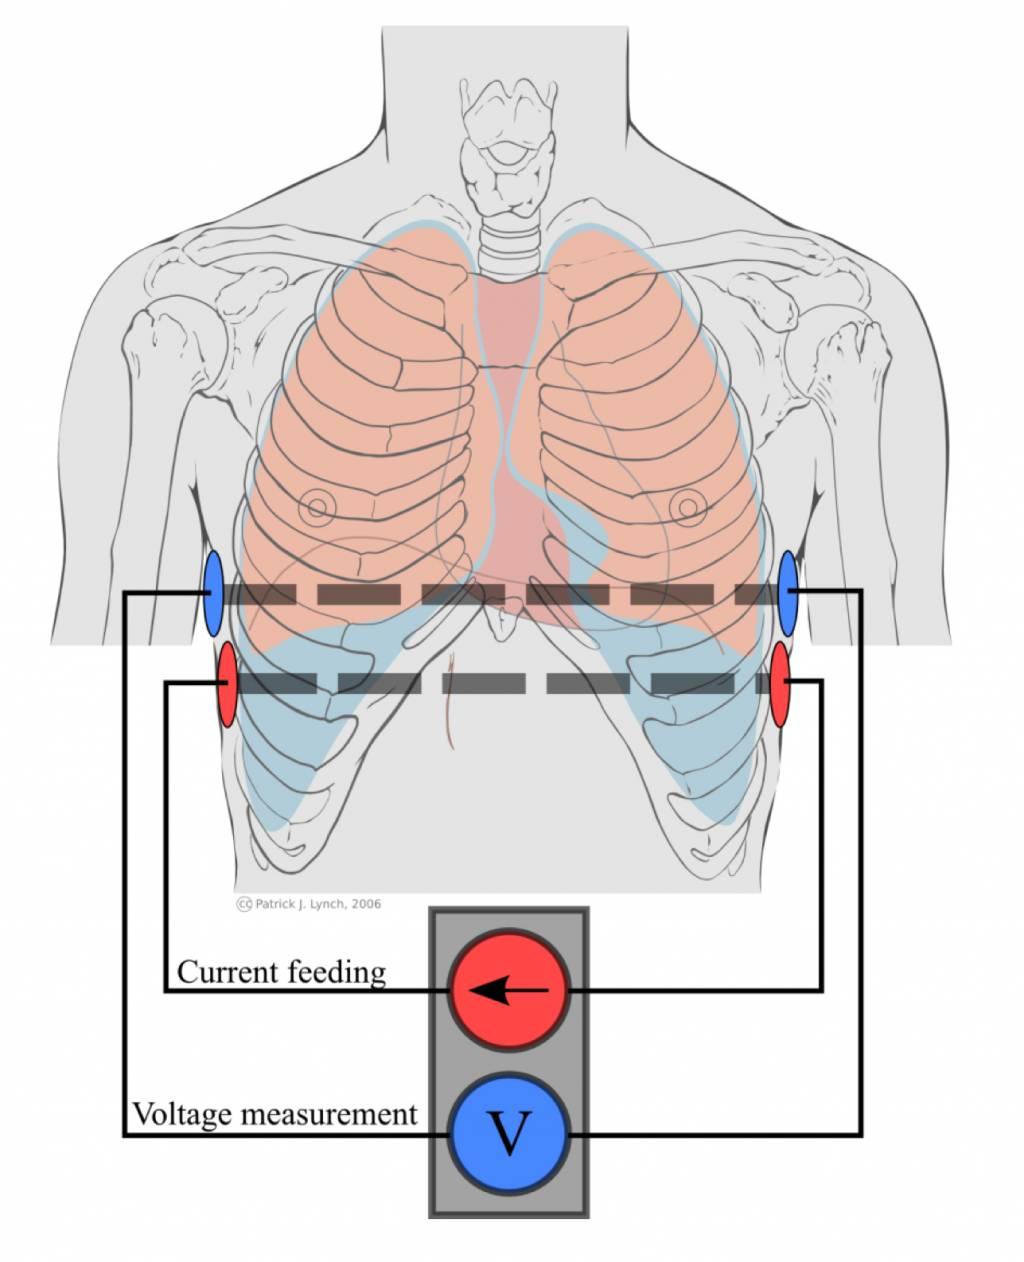 Pulmonary ventilation by impedance pneumography